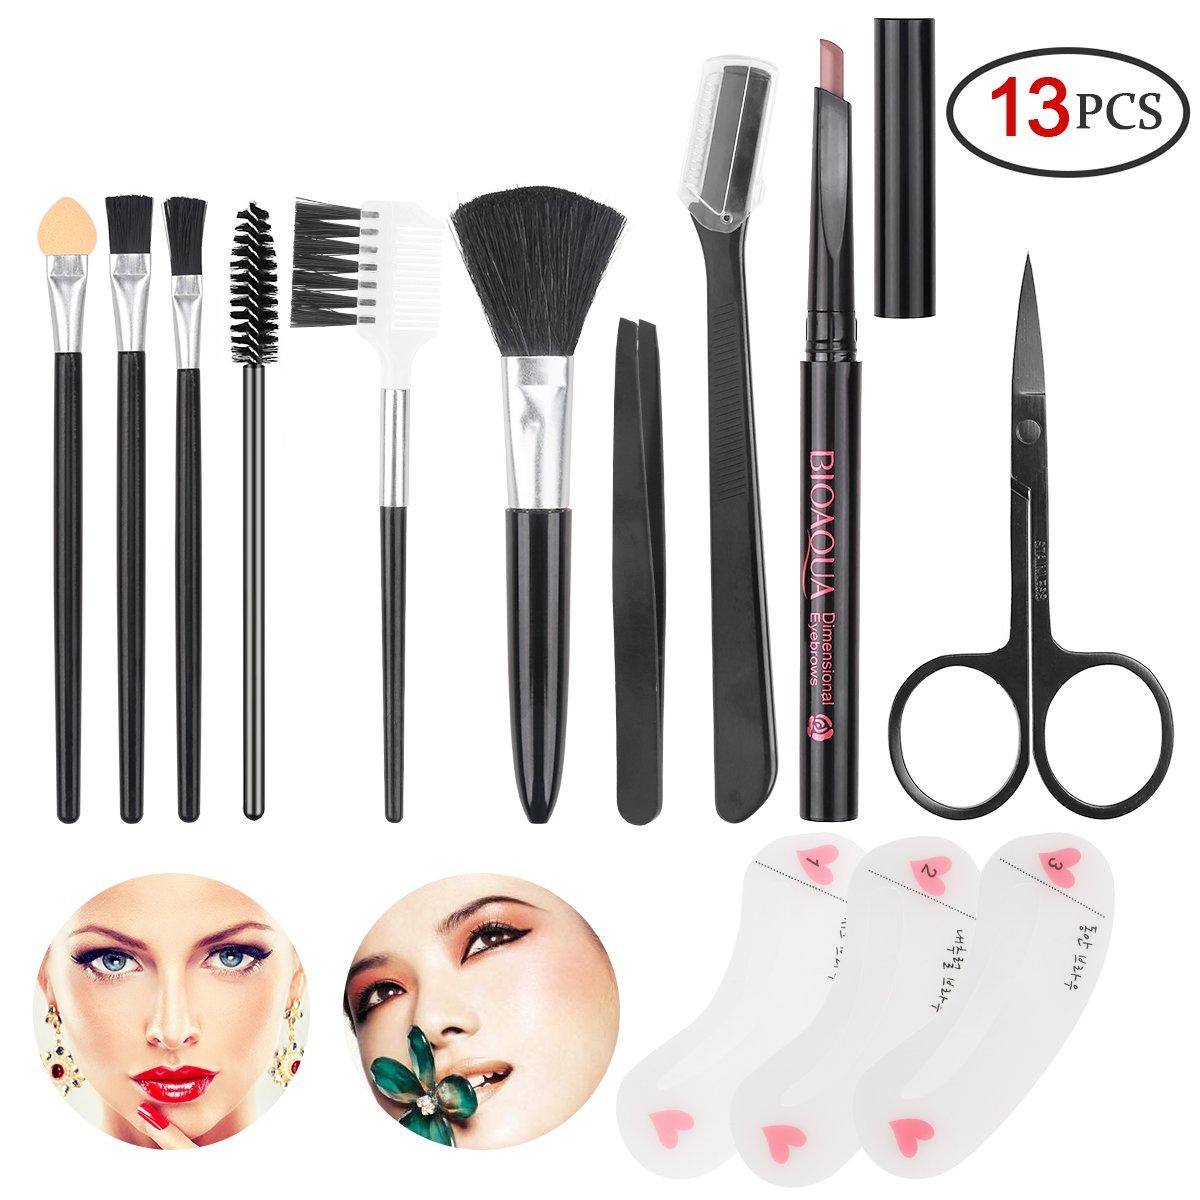 Eyebrow Kit Eyeshadow Brushes Blush Brush Stencil Tweezers Makeup Brush Set for Women and Maiden and Teenage Girls (Dark Brown Eyebrow Pencil) SENXILLER